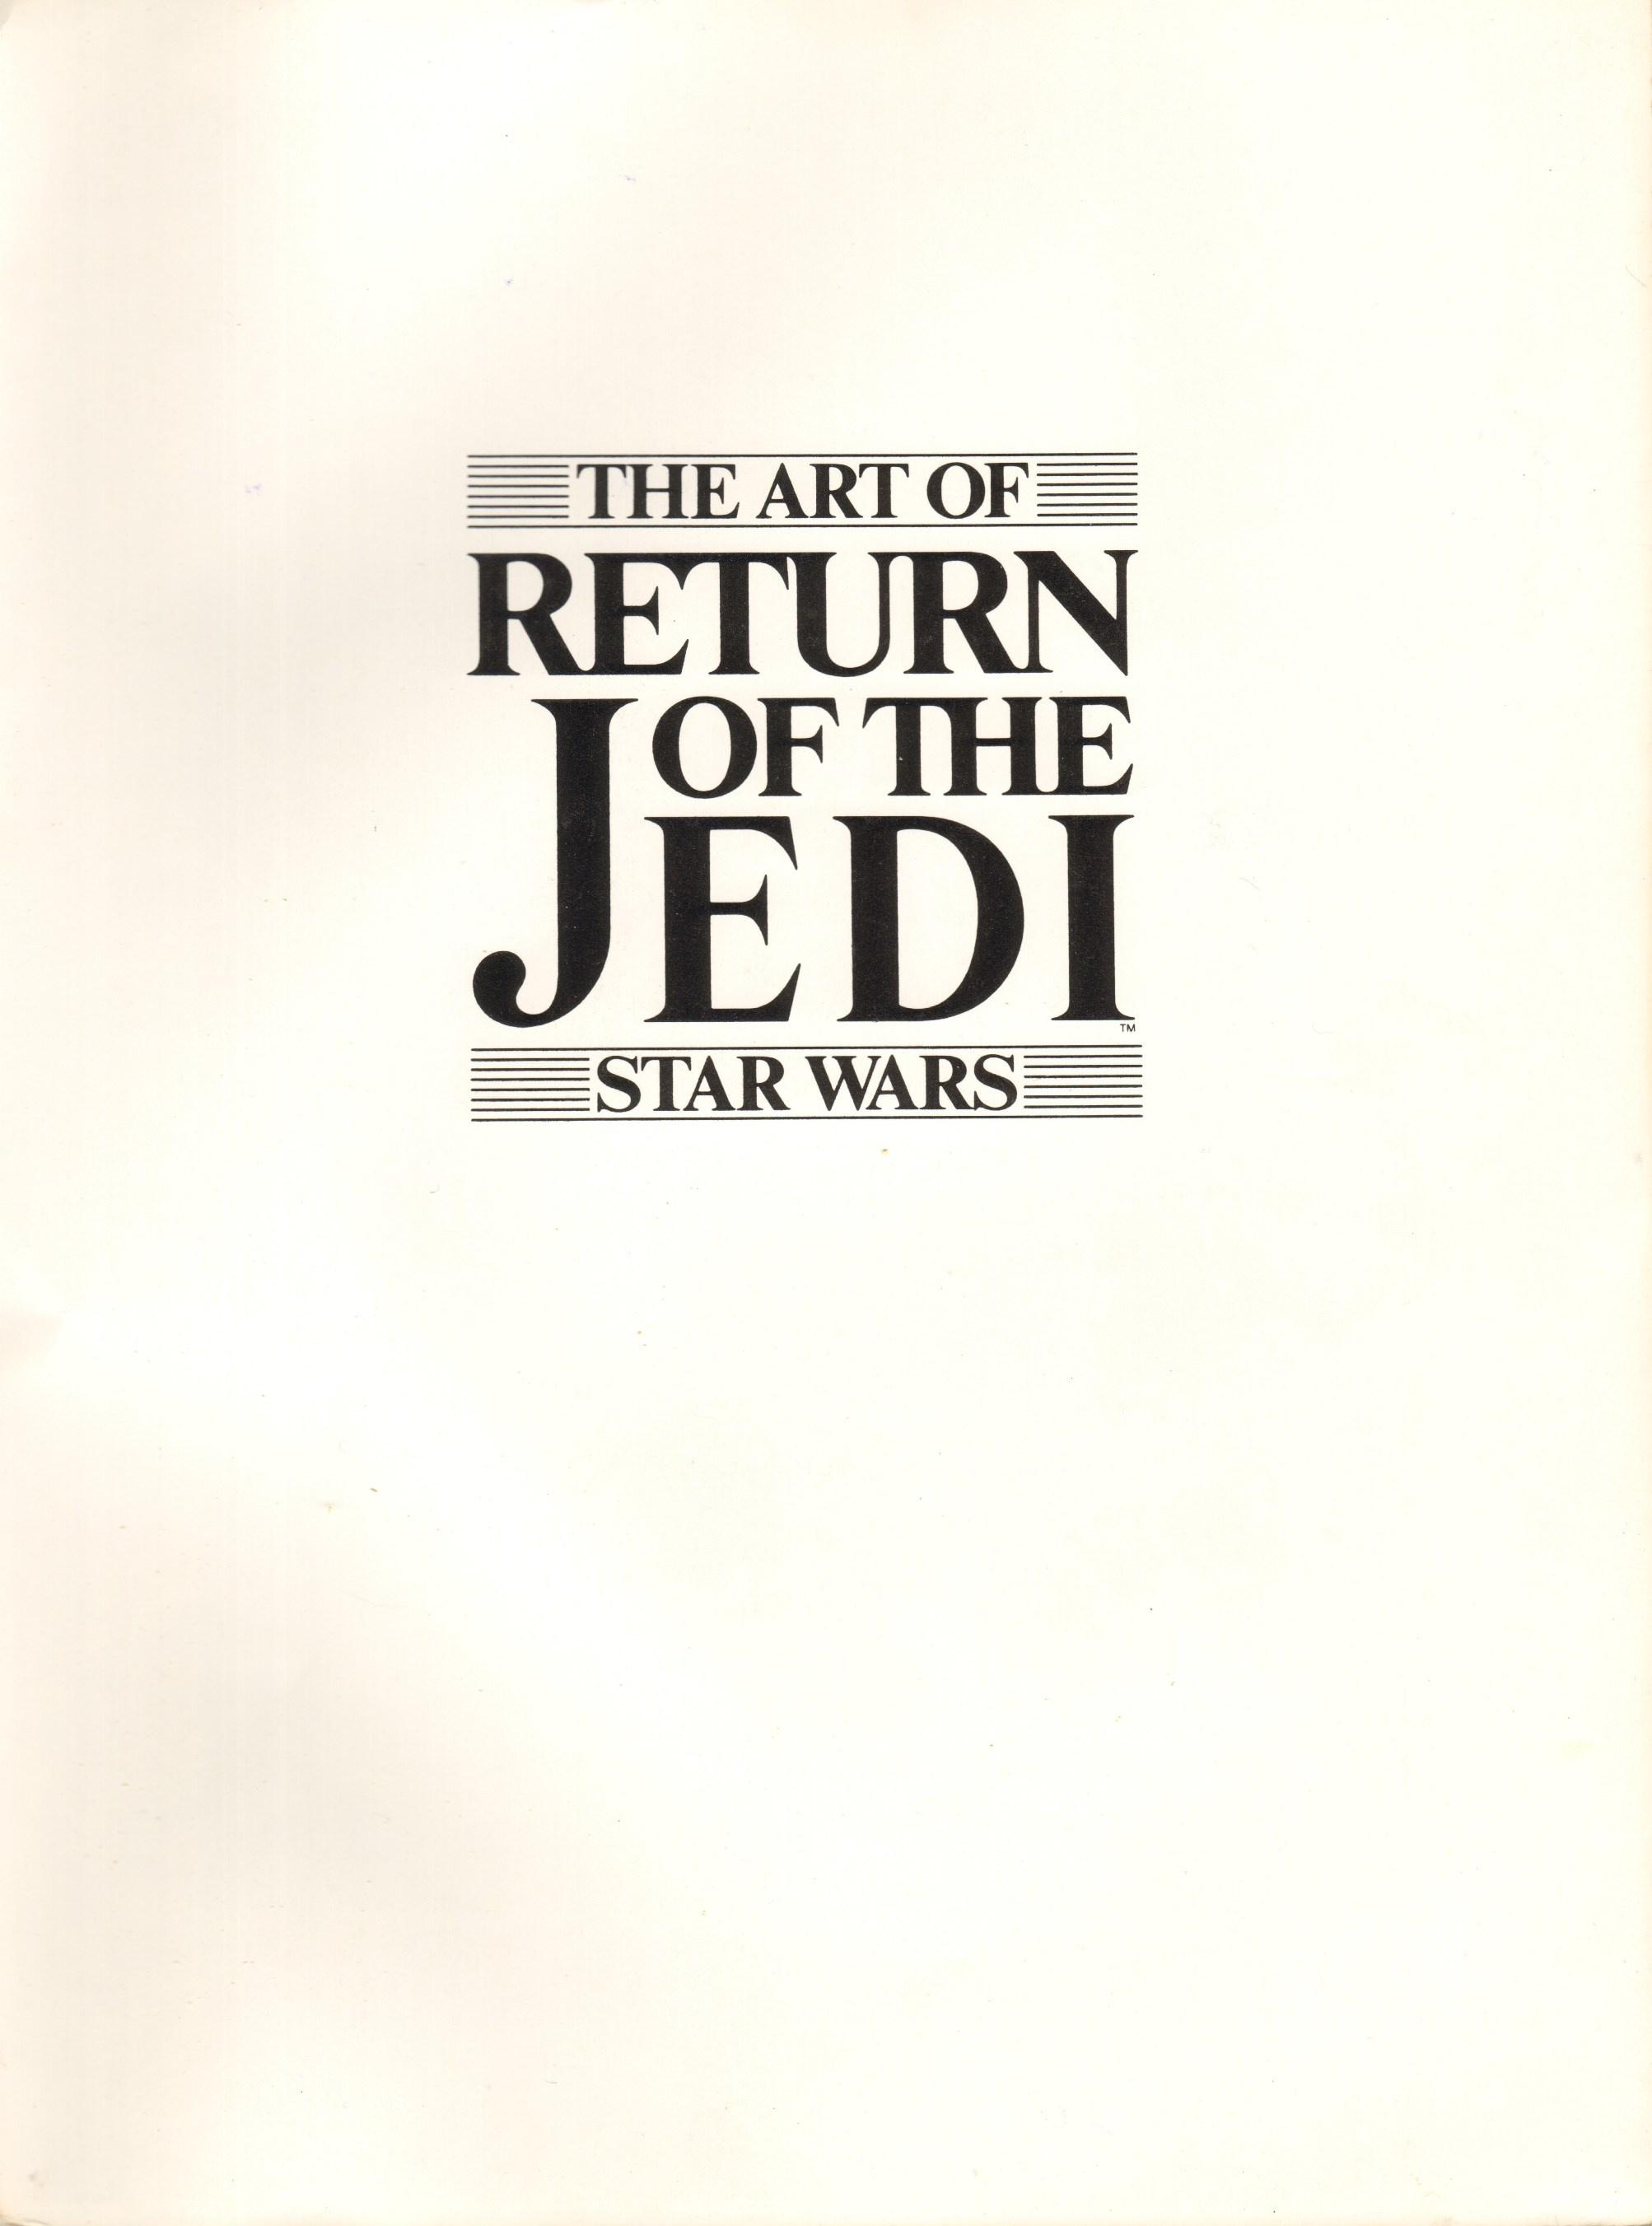 Art of Return of the Jedi (b0bafett_Empire)-p000b